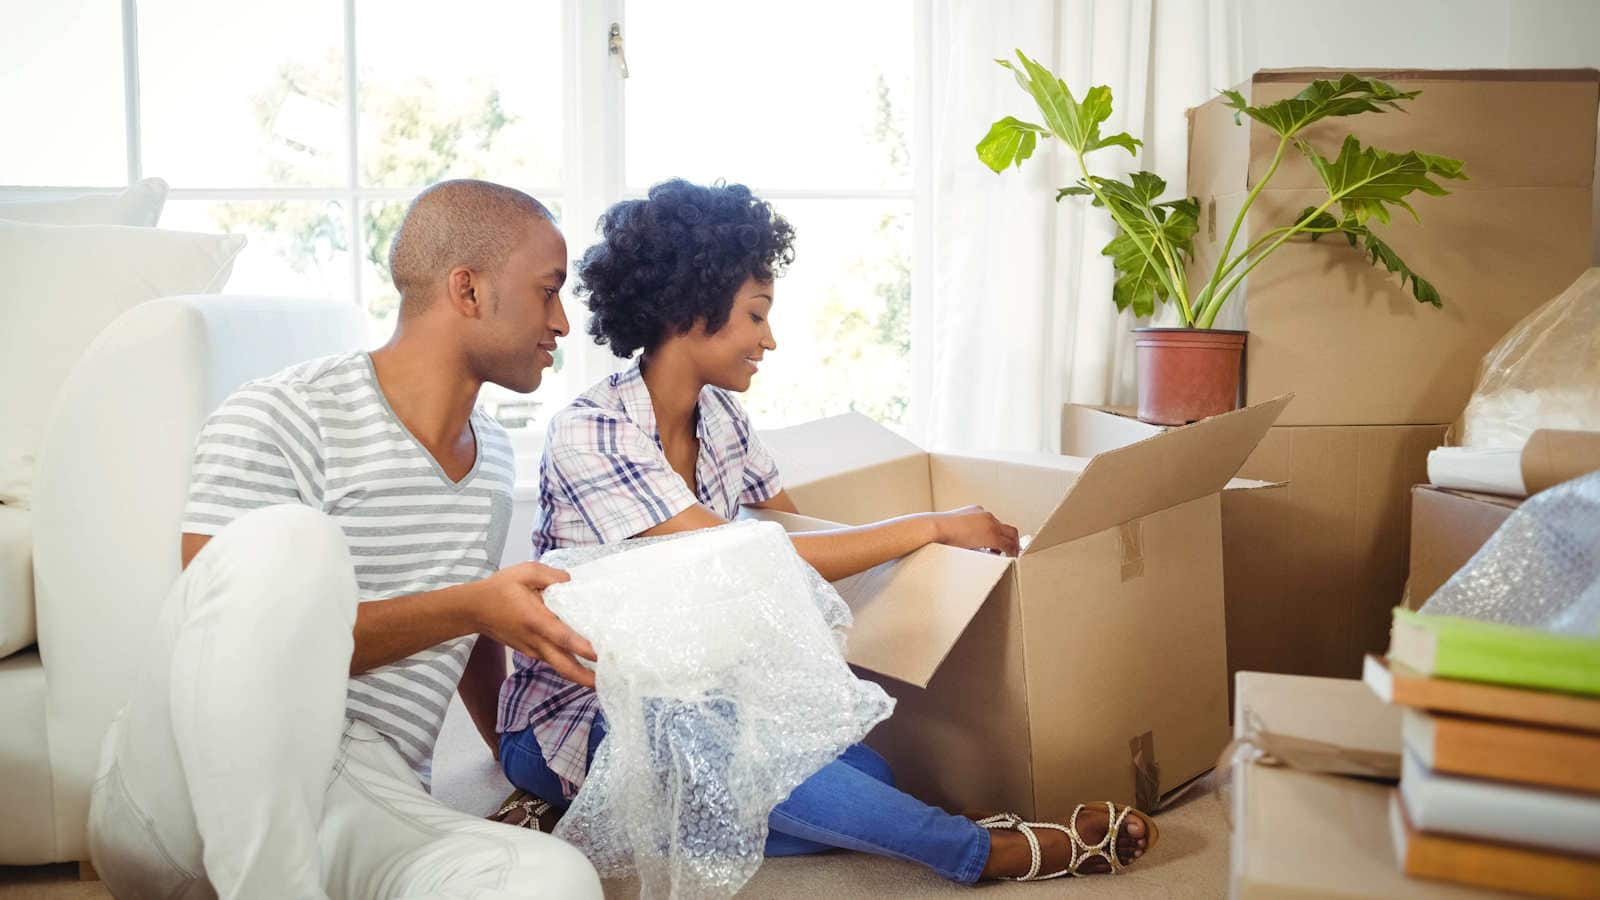 WA Statewide Furniture Removals of Malaga